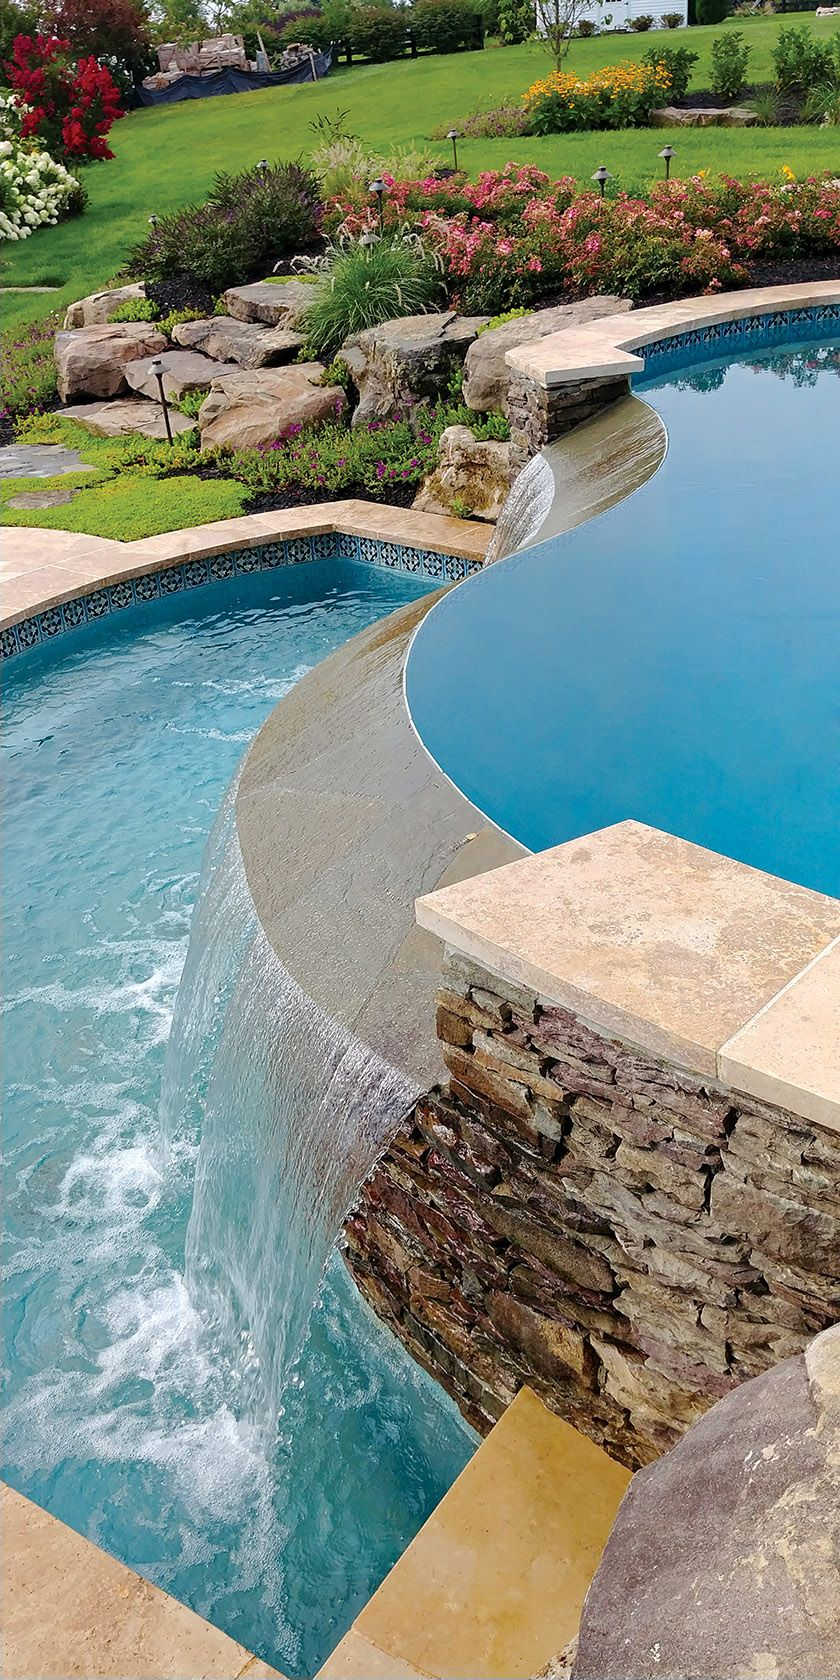 A serpentine, infinity-edge pool in Aldie, Virginia ... on Colao & Peter Luxury Outdoor Living id=34695